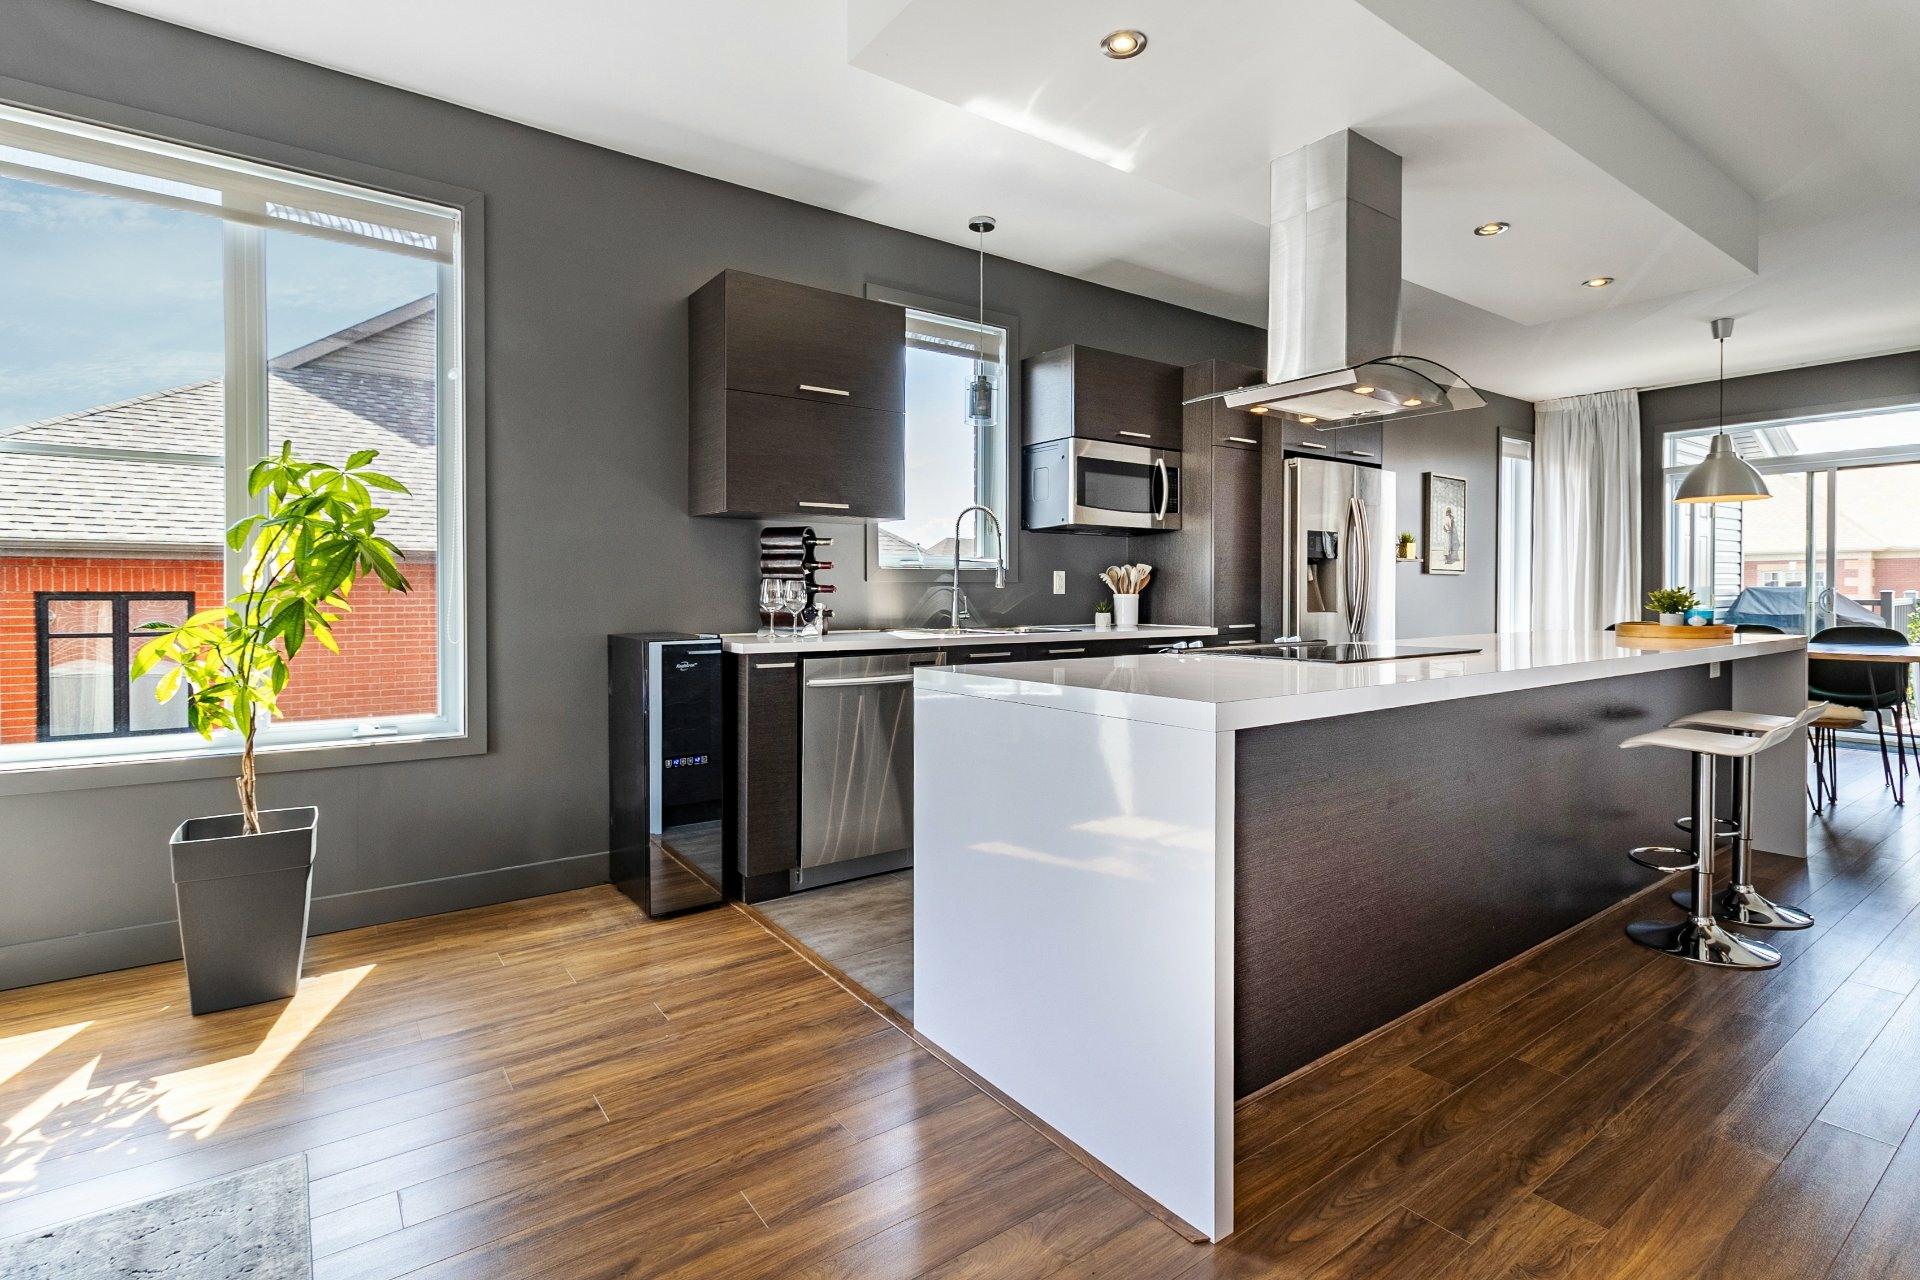 image 9 - Apartment For sale Saint-Hubert Longueuil  - 7 rooms